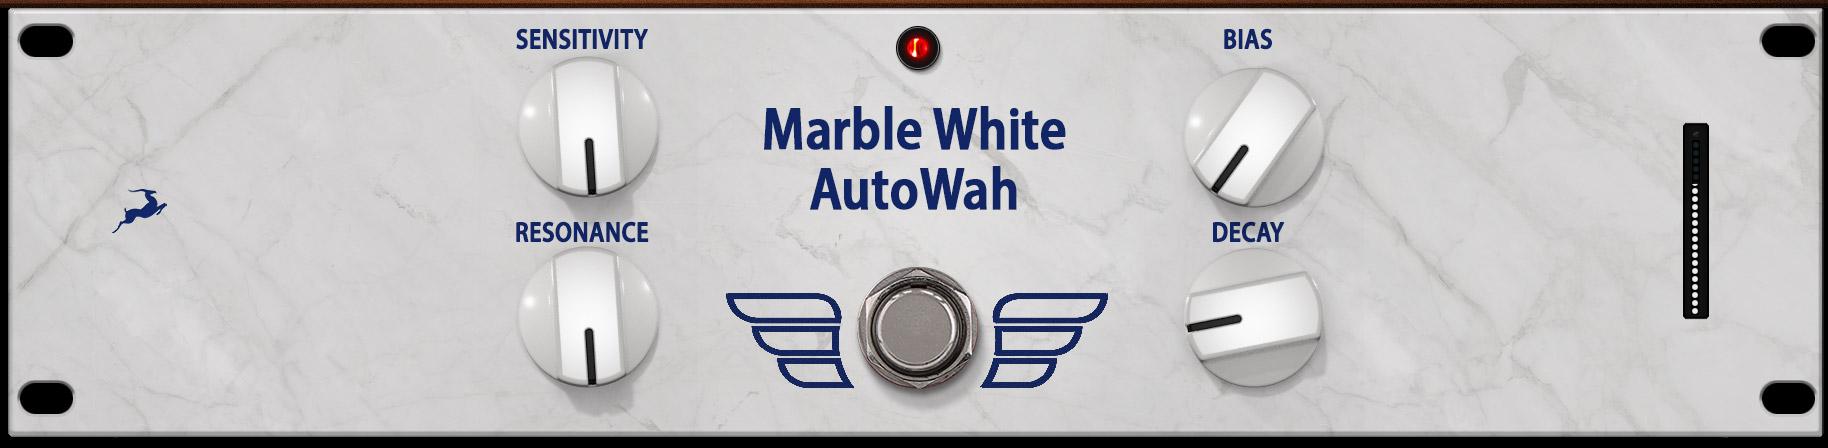 Marble White AutoWah small